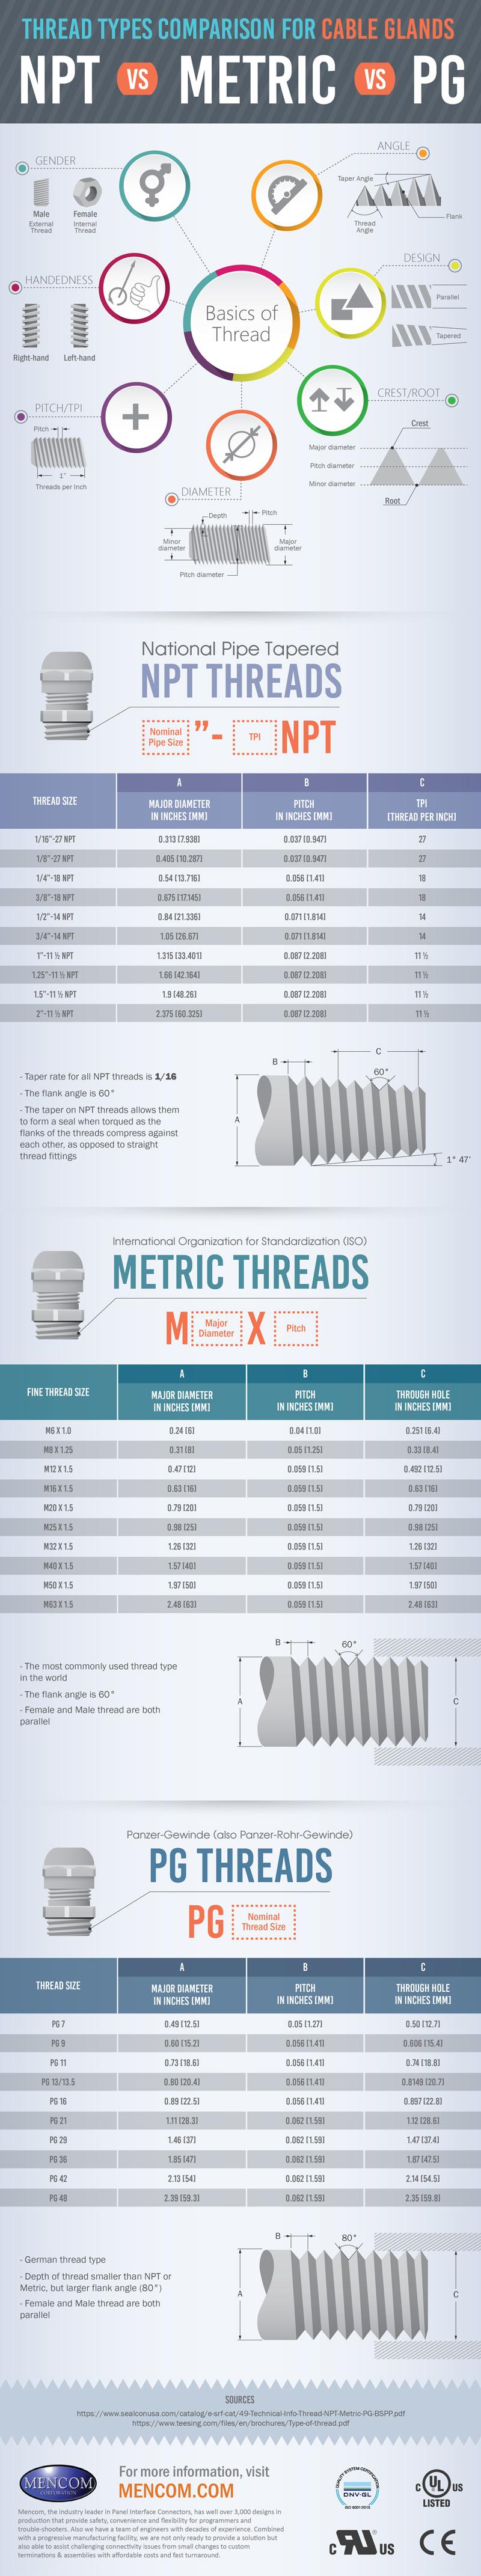 Cable Gland Threads Comparison